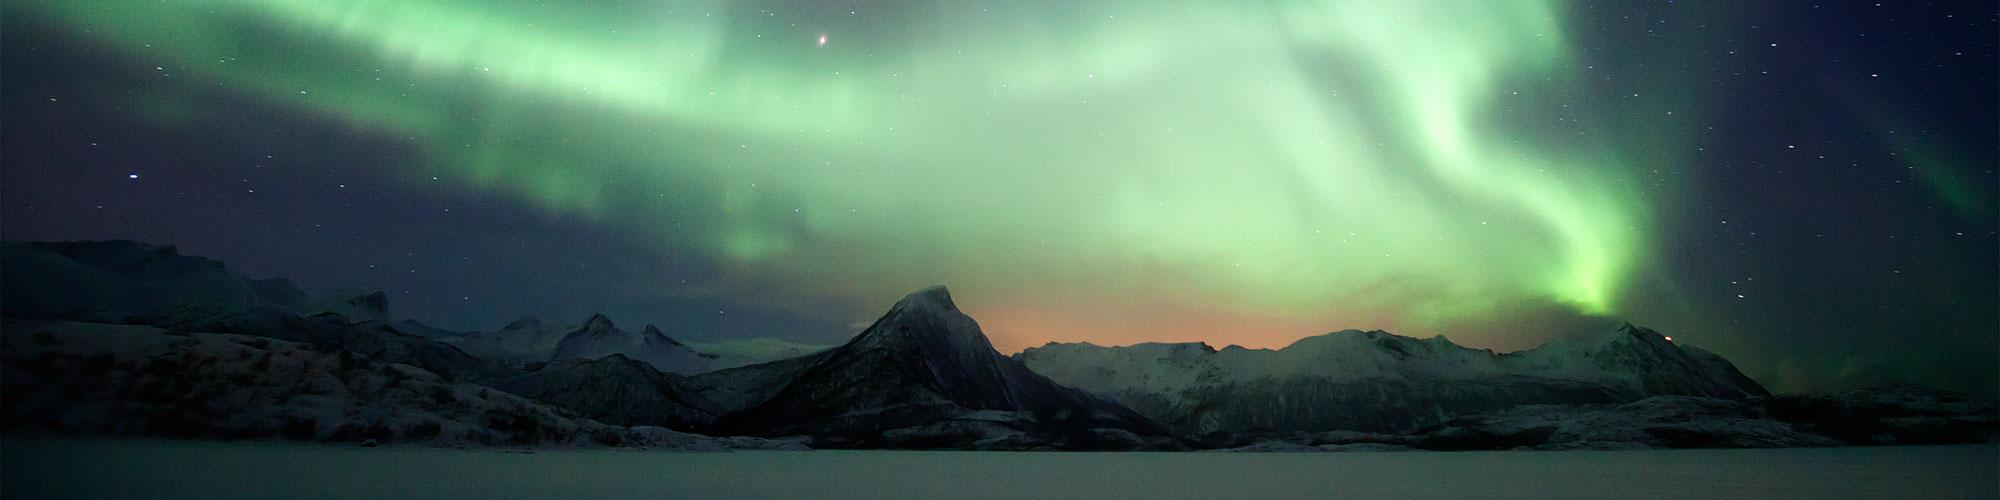 ©Smitinbeeld - Aurora en Landscape Lofoten